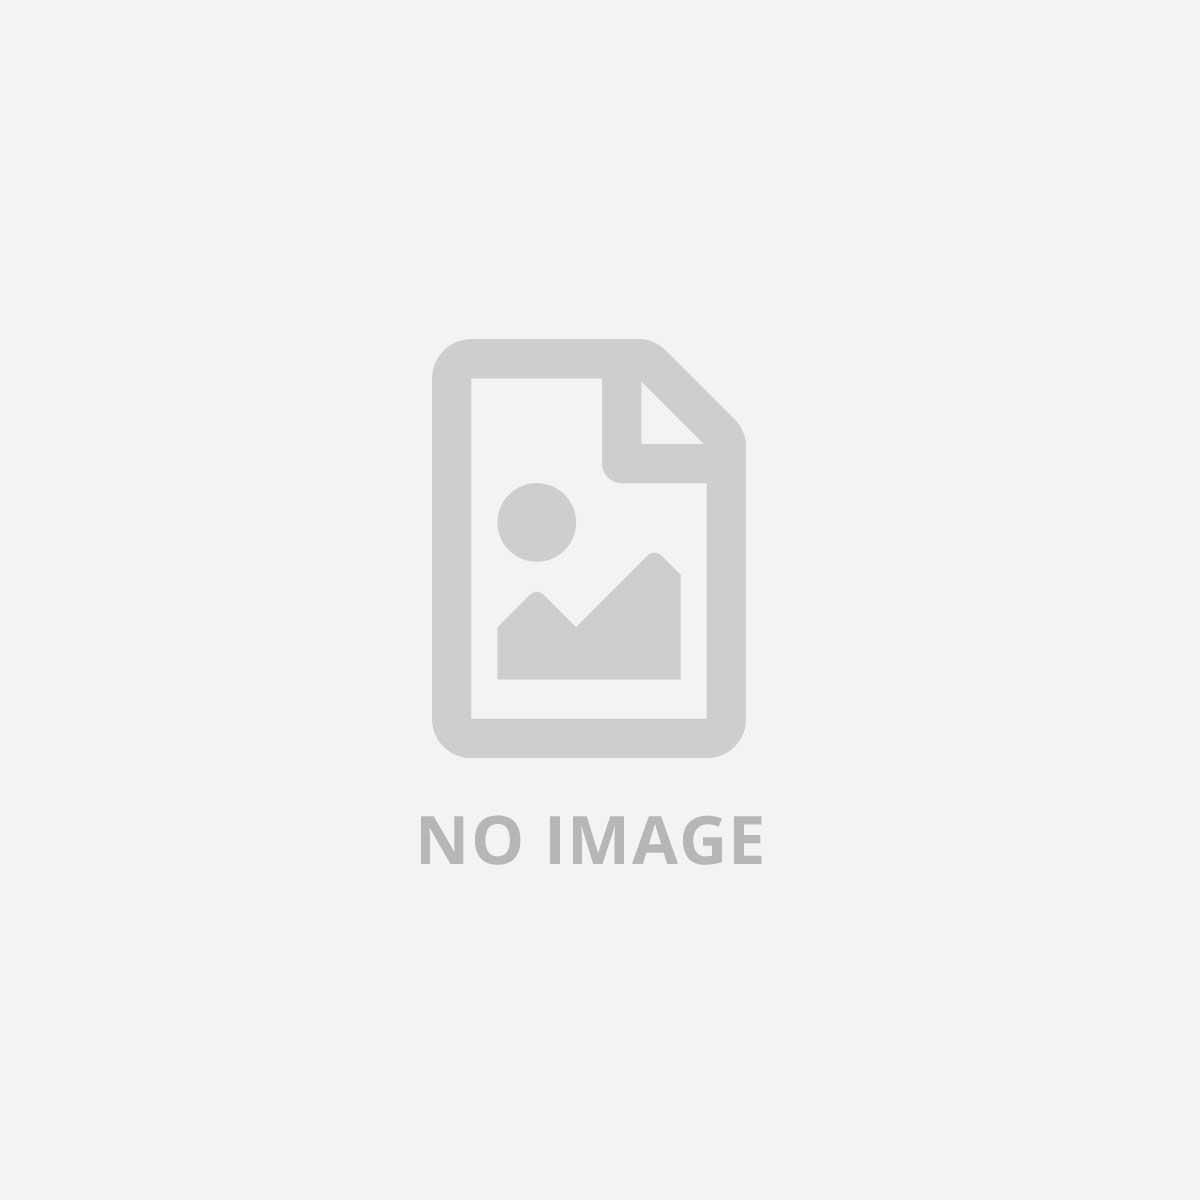 NILOX USB BULK 2GB 2.0 A